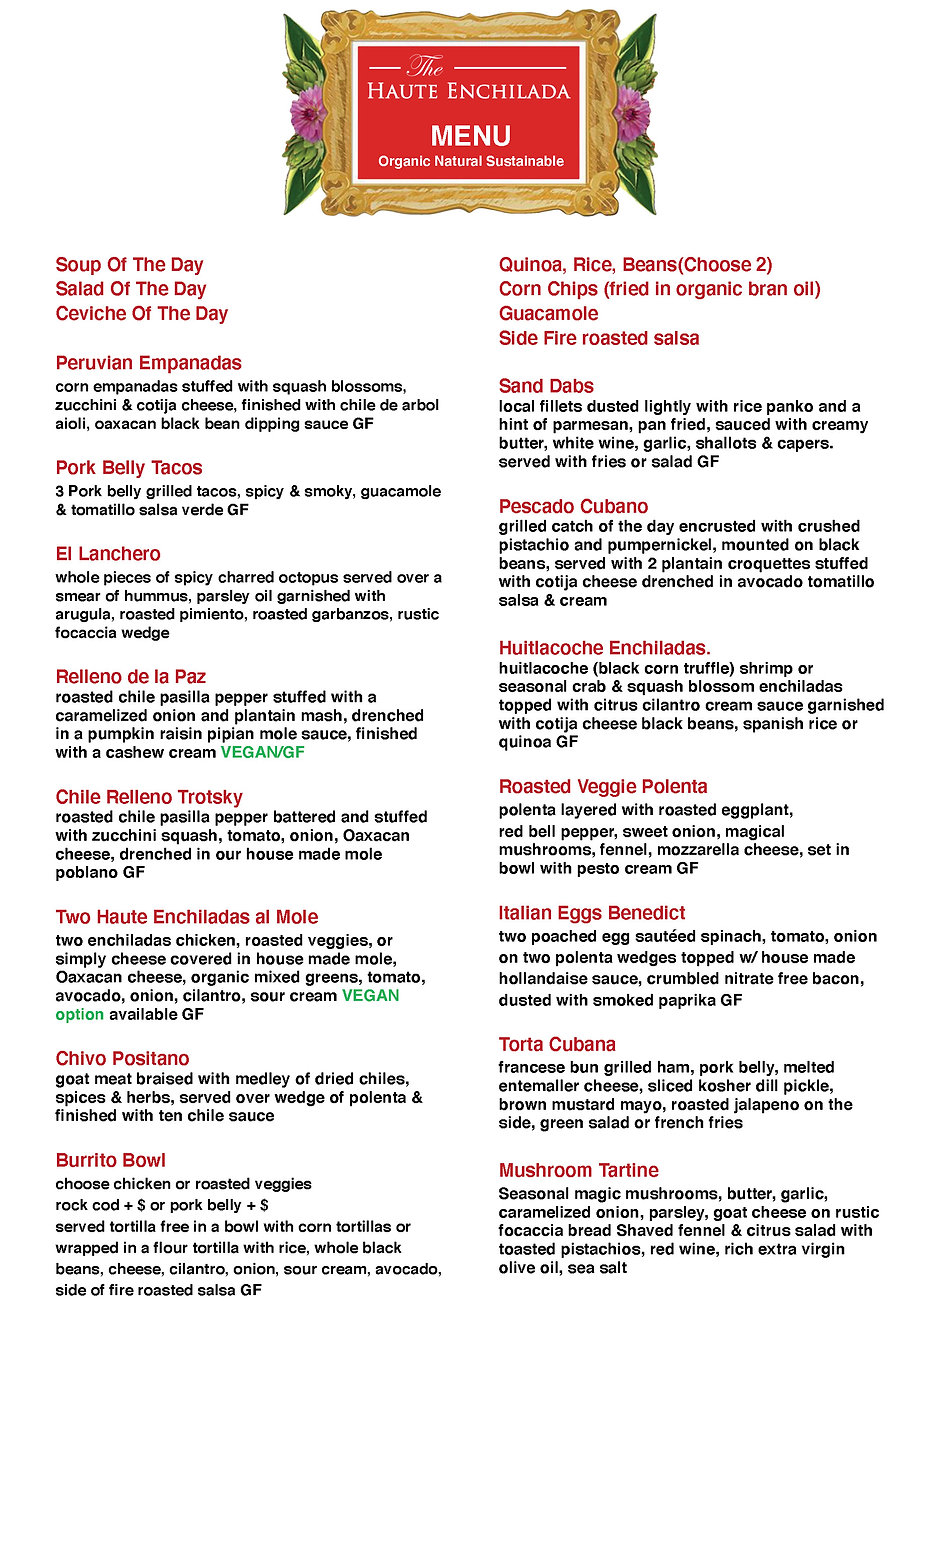 June 10 Haute Food Menu_noprices.jpg